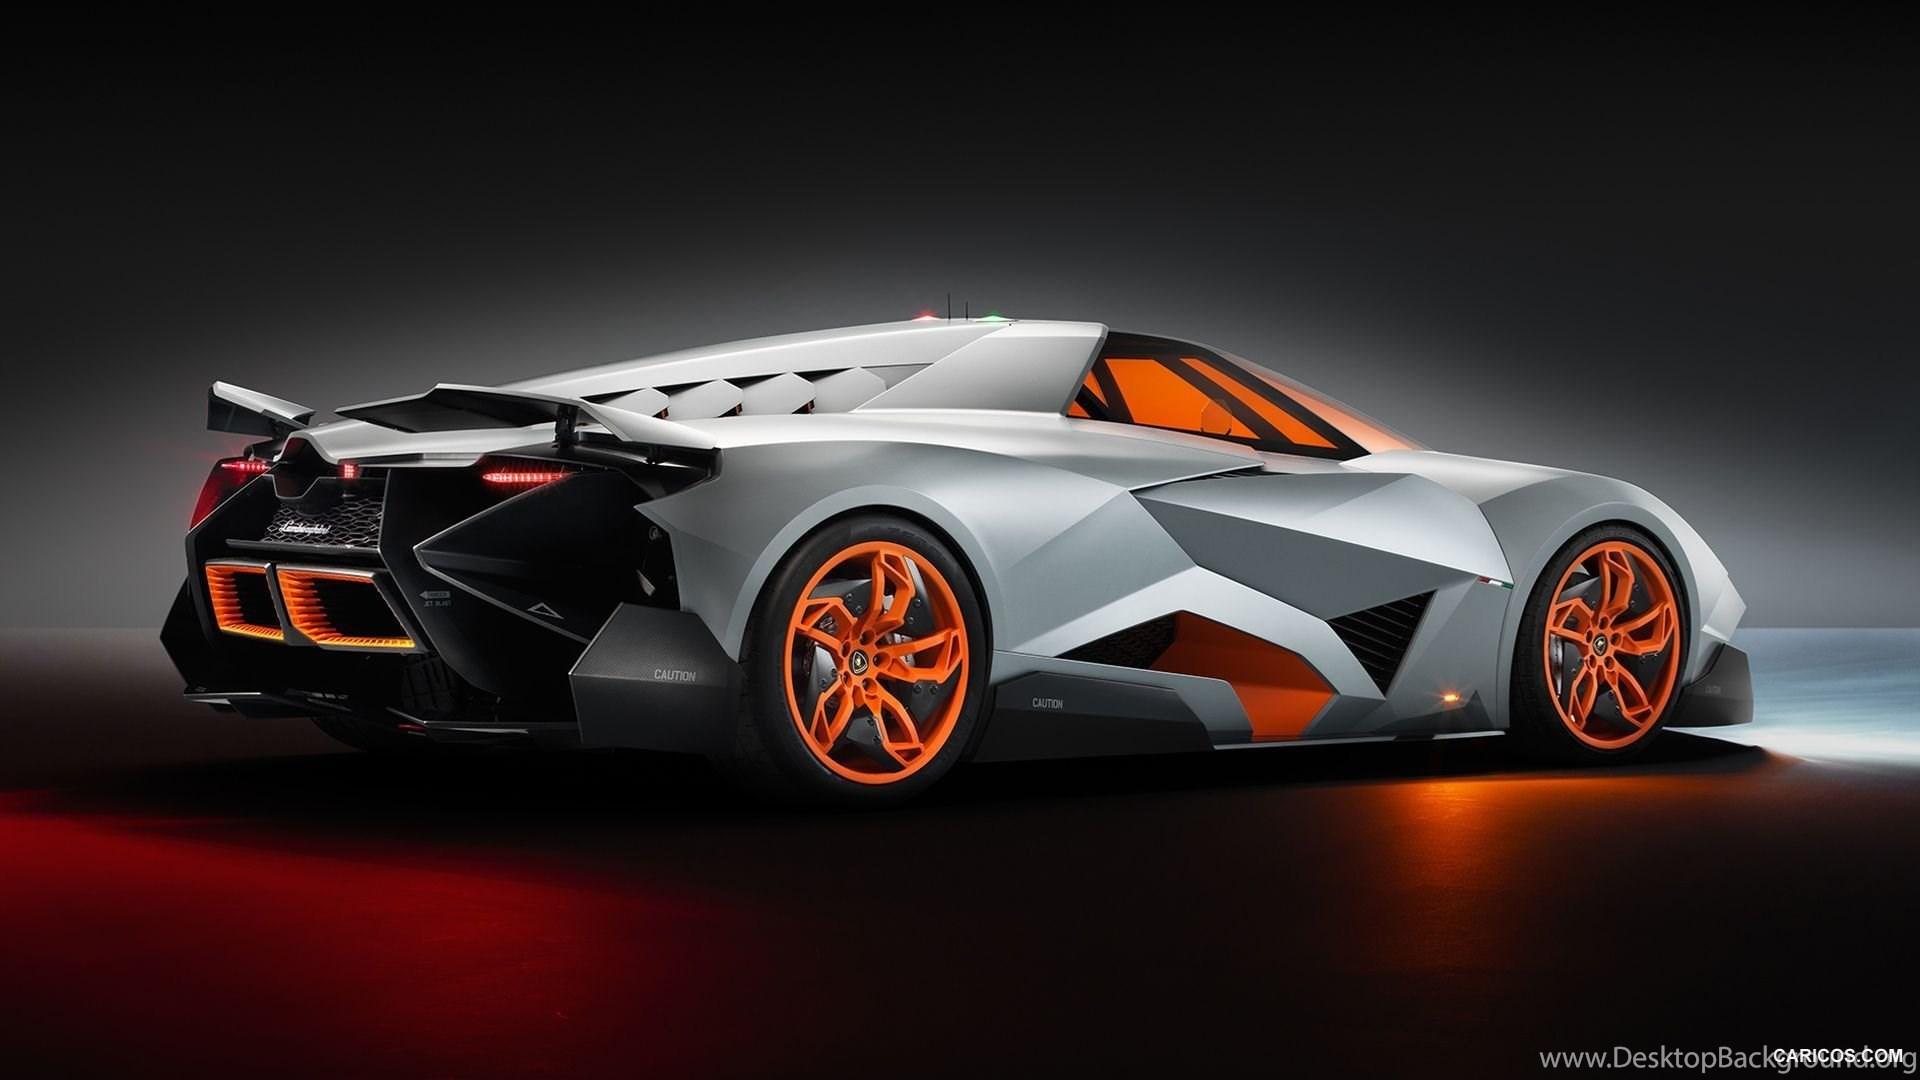 Lamborghini Wallpapers Widescreen Image Desktop Background